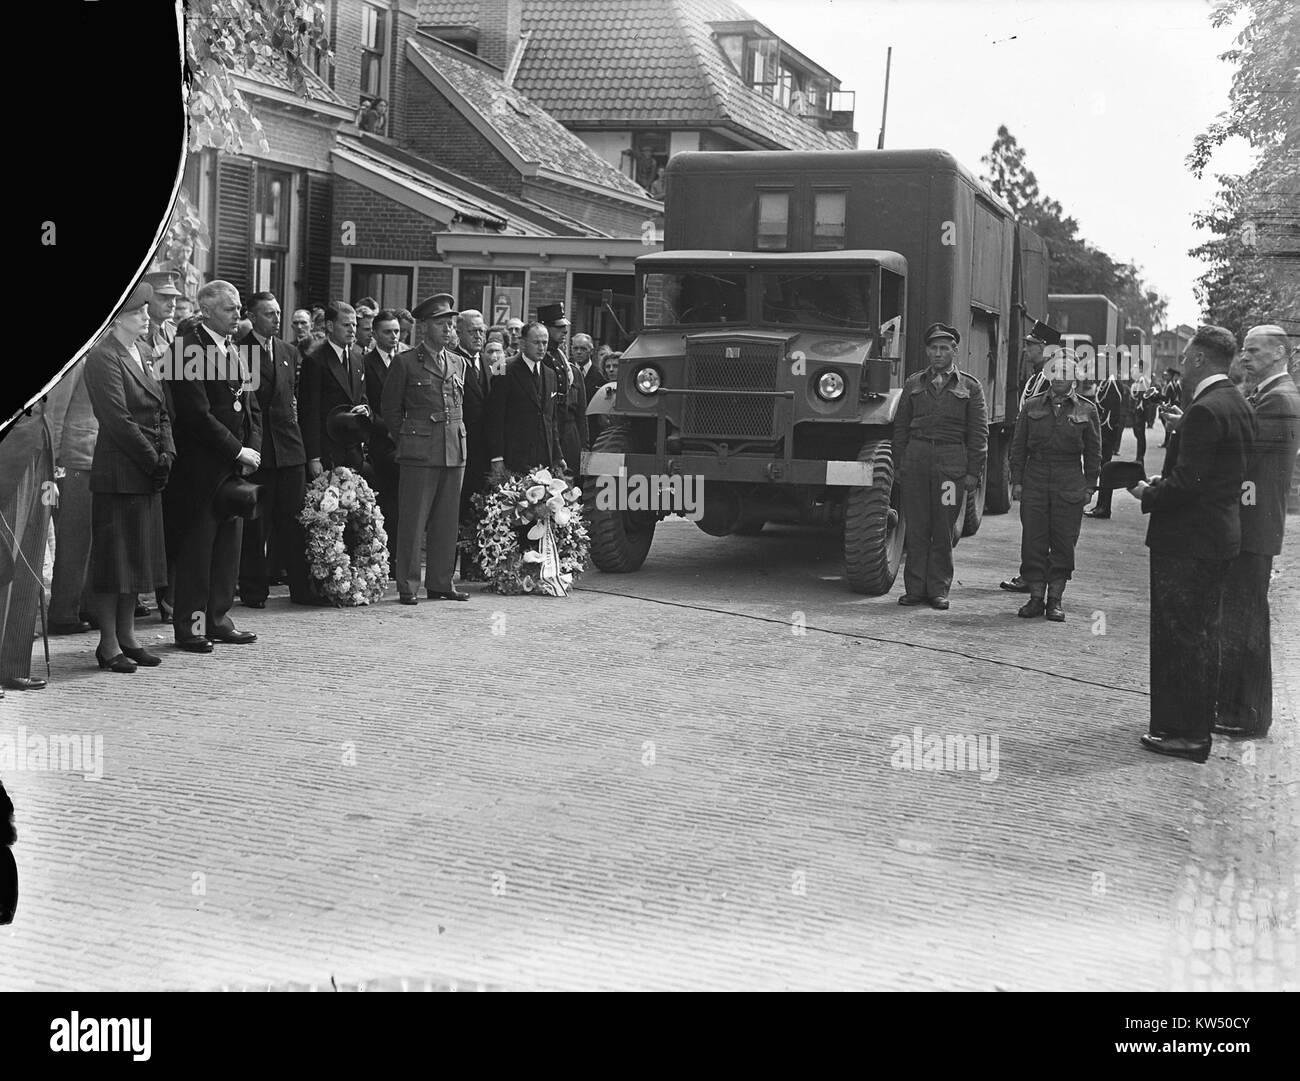 Bodemtransport uit Duitsland Beel, Bestanddeelnr 902 7728 - Stock Image